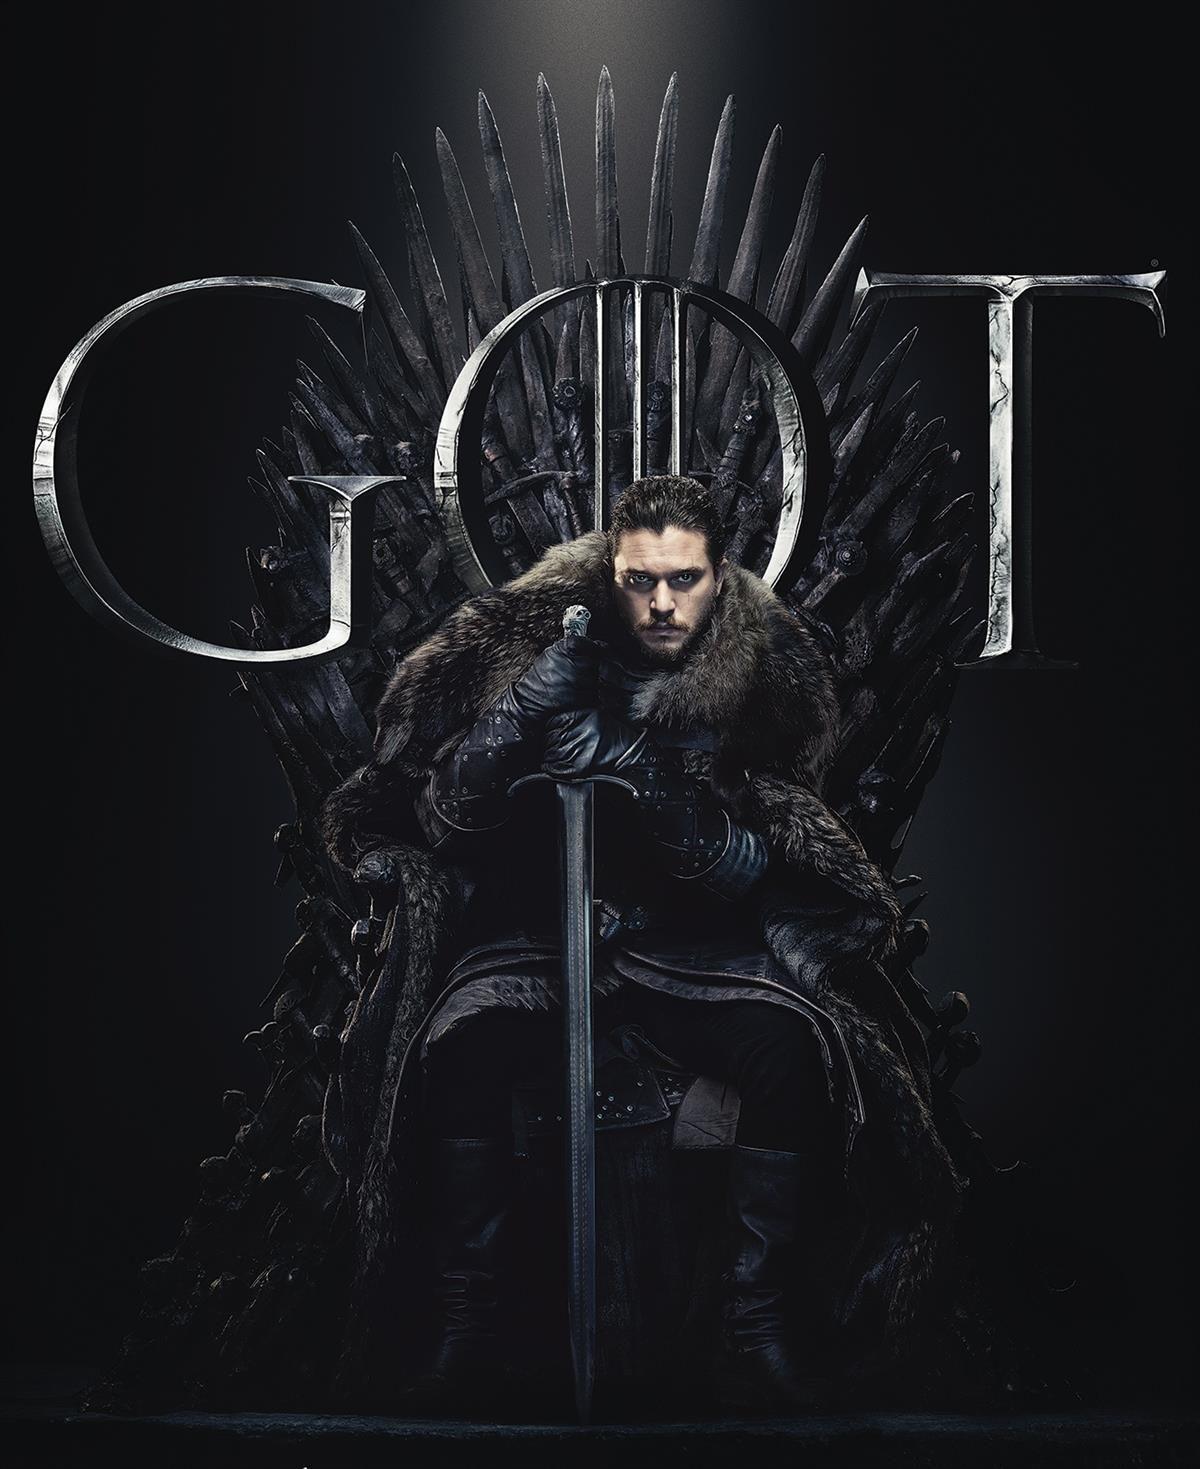 Game Of Thrones Season 8 Jon Snow Poster Game Of Thrones Poster